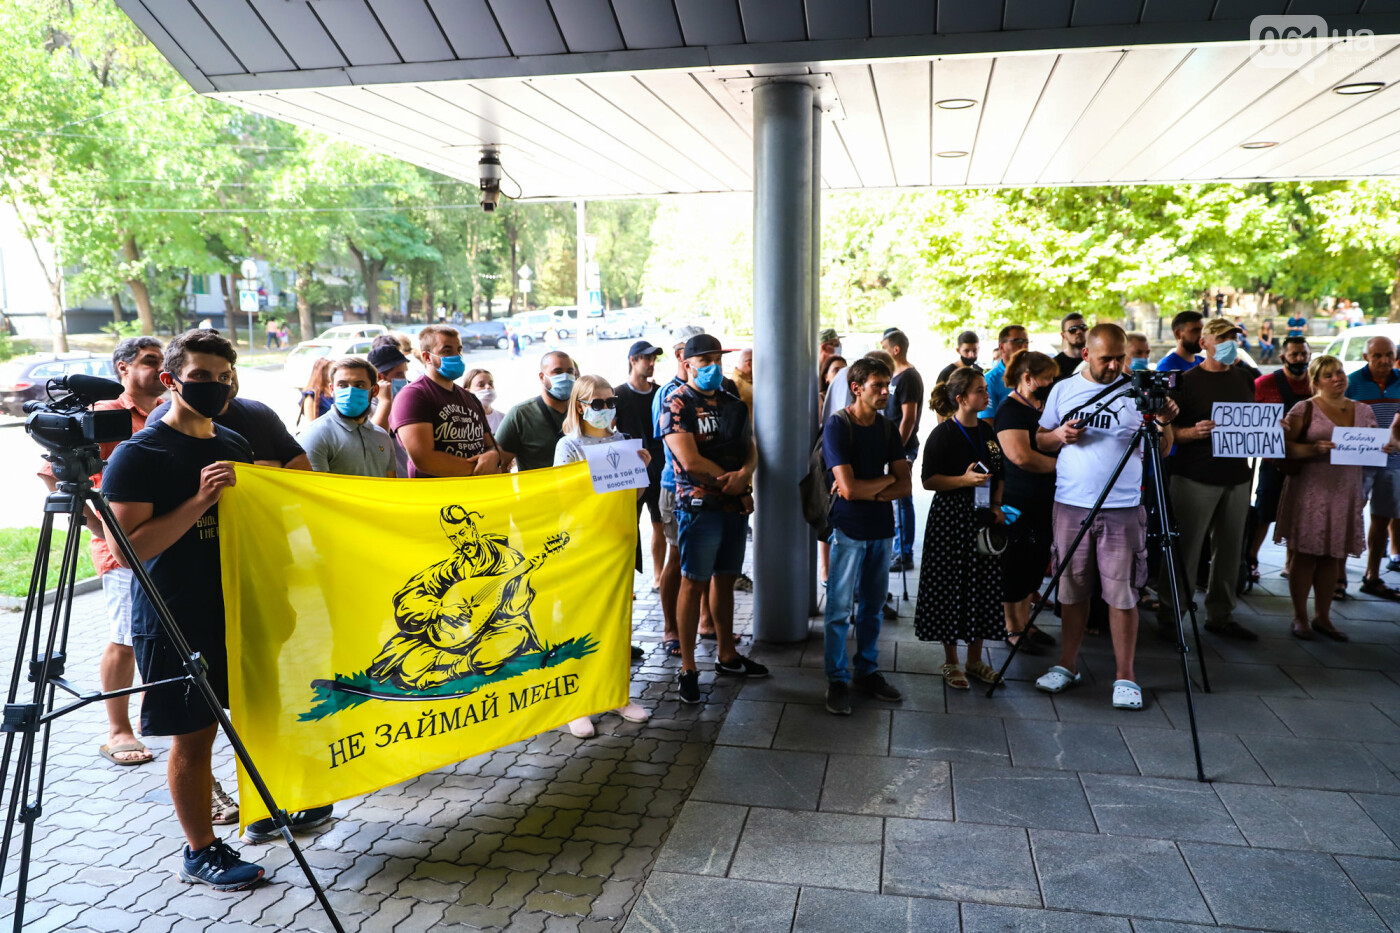 """Захист країни - не злочин"": в Запорожье патриоты провели митинг у стен нацполиции, - ФОТОРЕПОРТАЖ , фото-14"